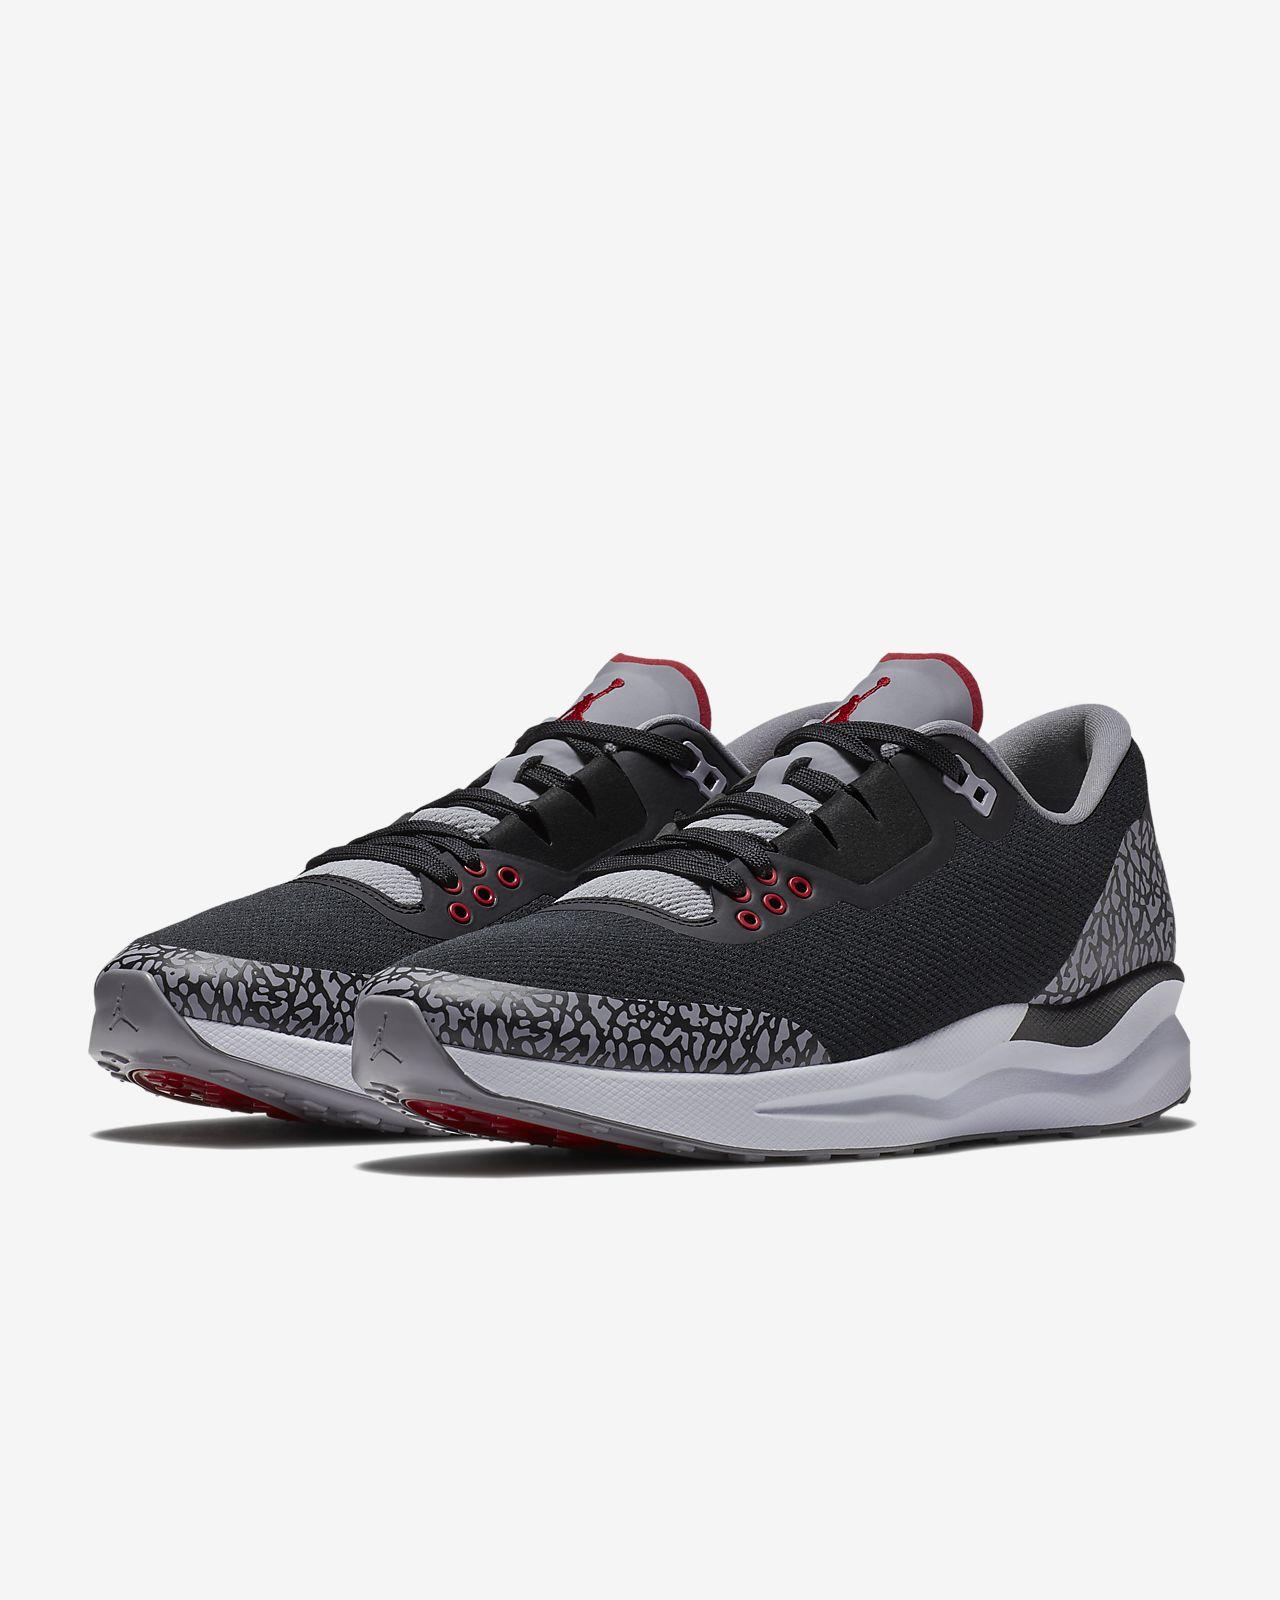 Nike Jordan Zoom Tenacity 88 Black Cement Retro size 9.5